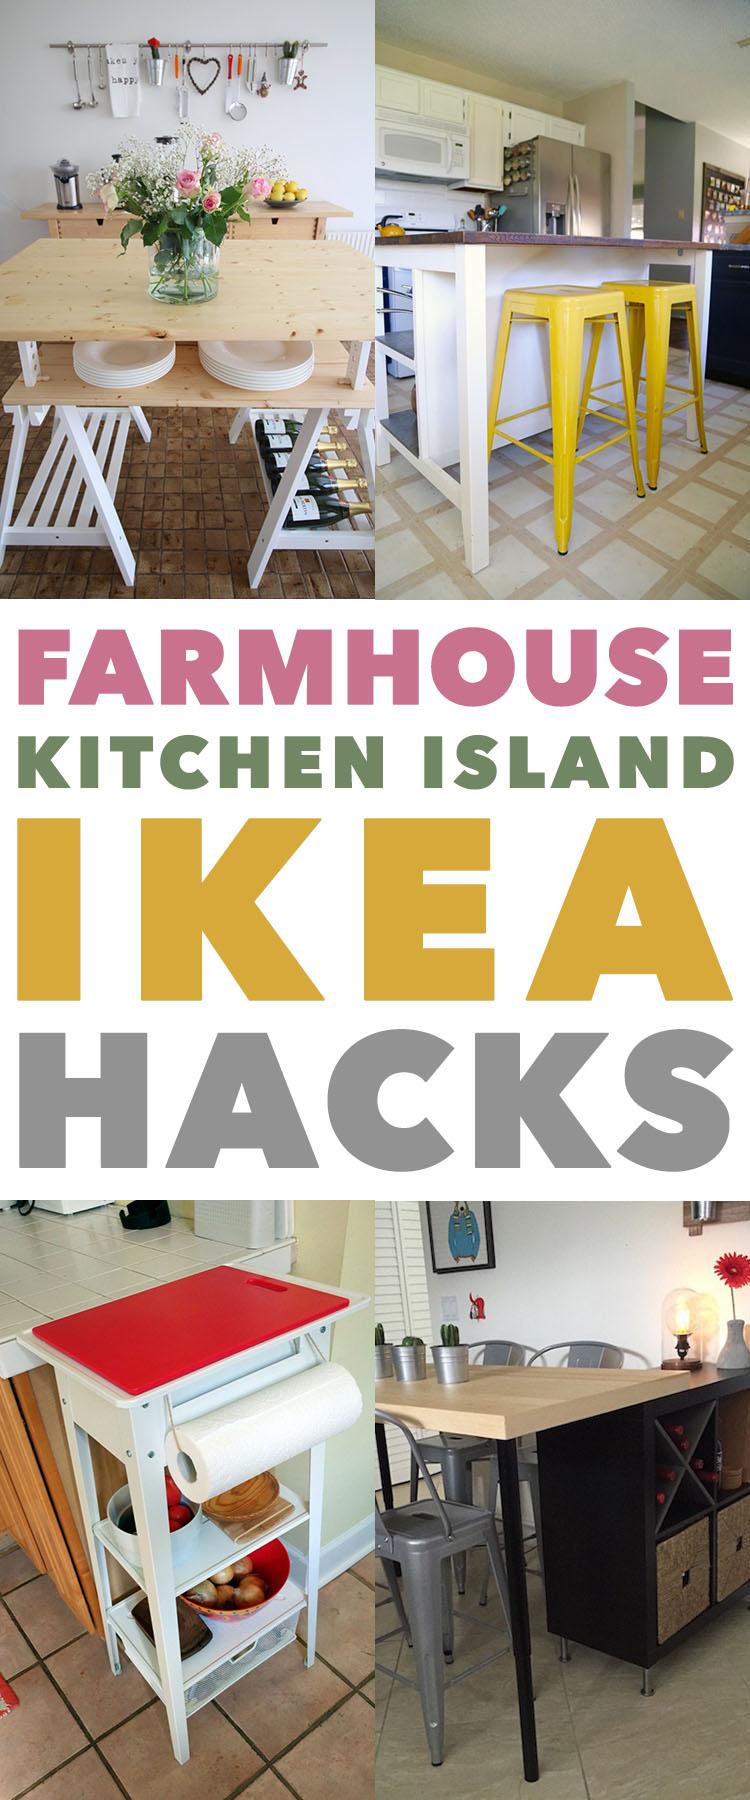 Farmhouse kitchen island IKEA hacks.